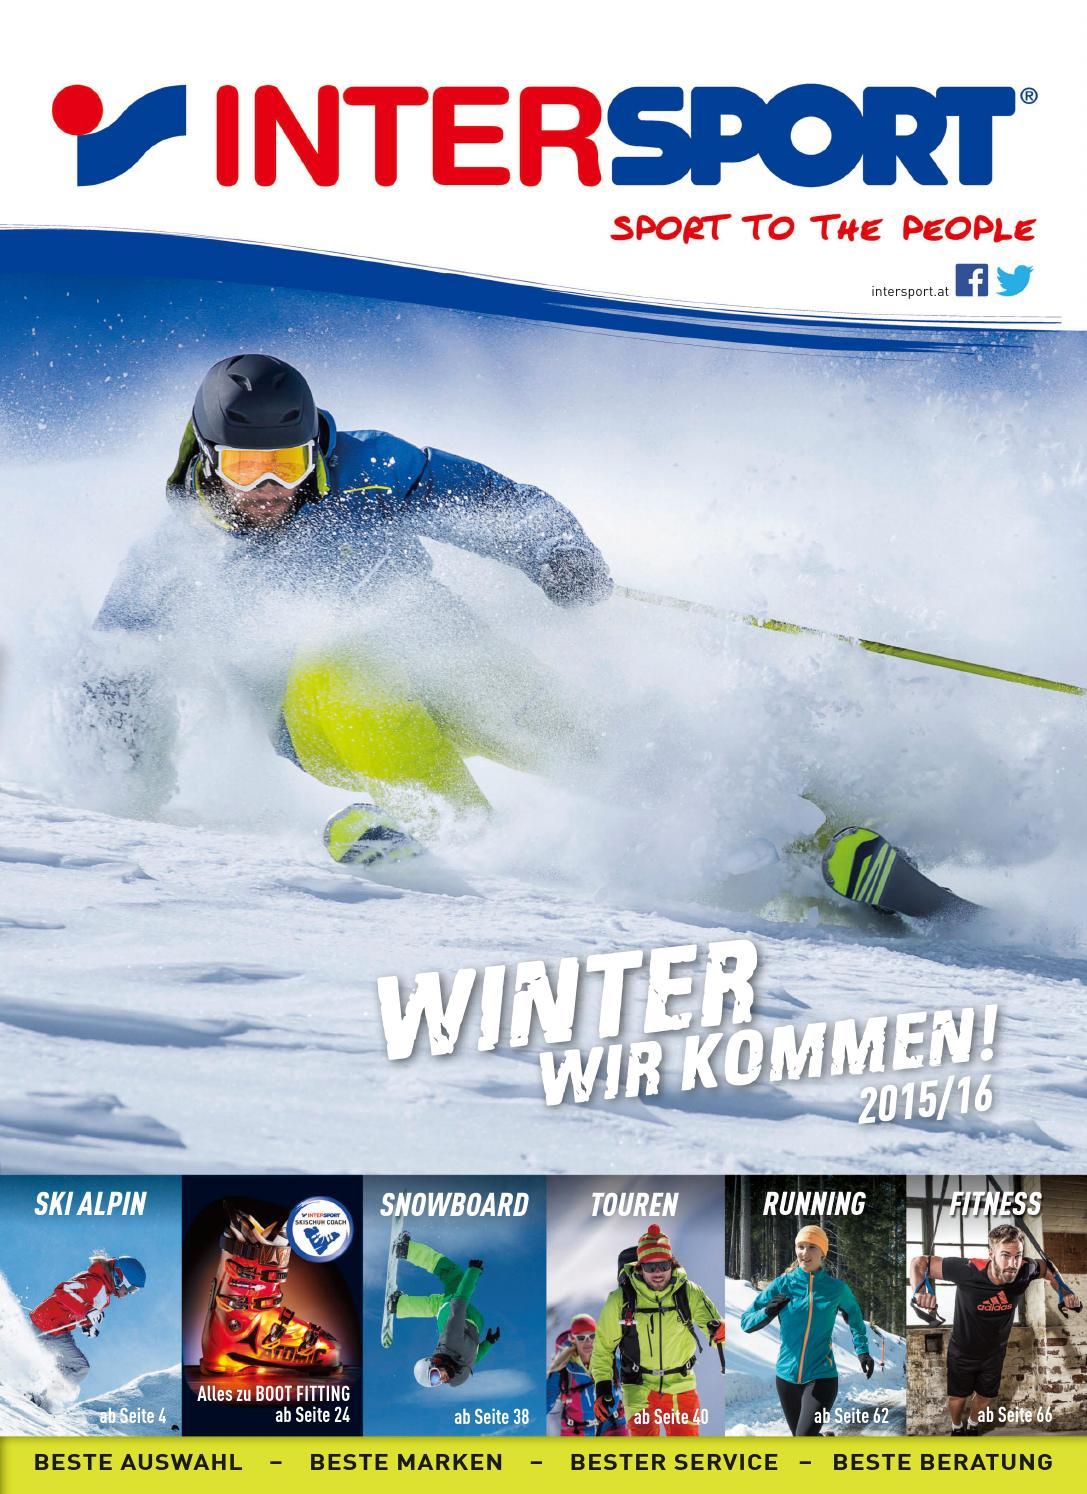 Letaky Zima1516 Rakouske Katalog By Intersport Issuu cT1JK3Fl